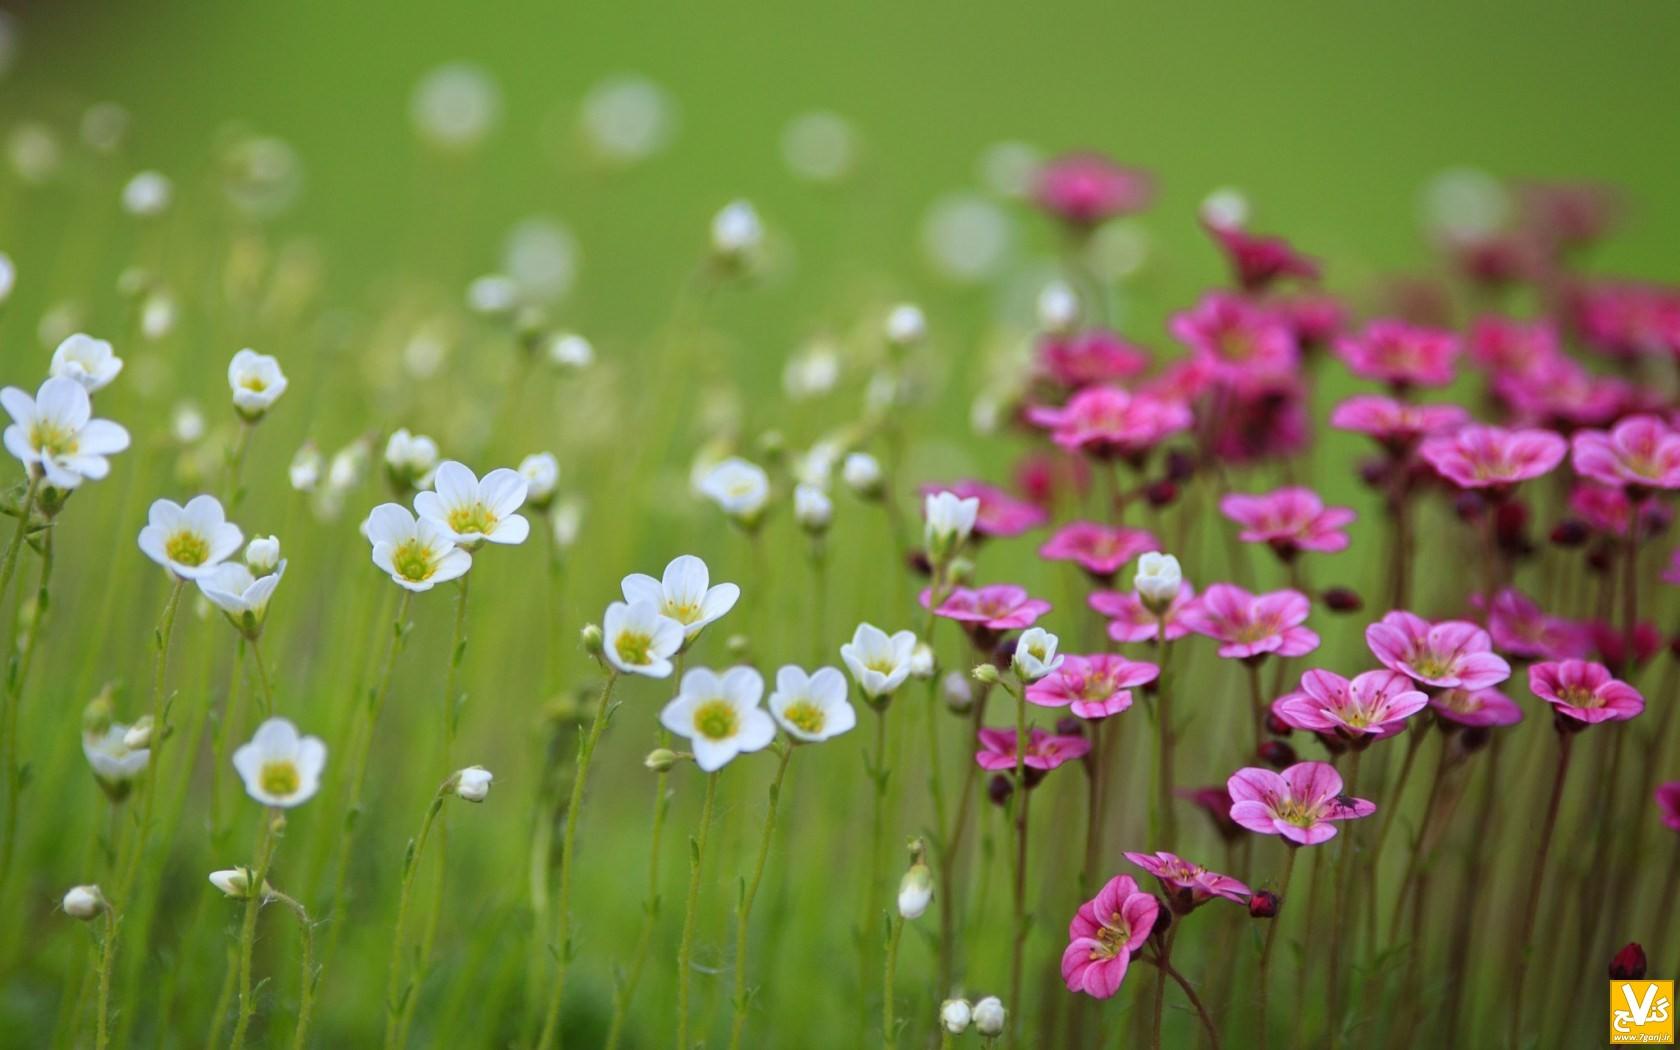 field-flowers-nature-bokeh-wallpaper-1680x1050